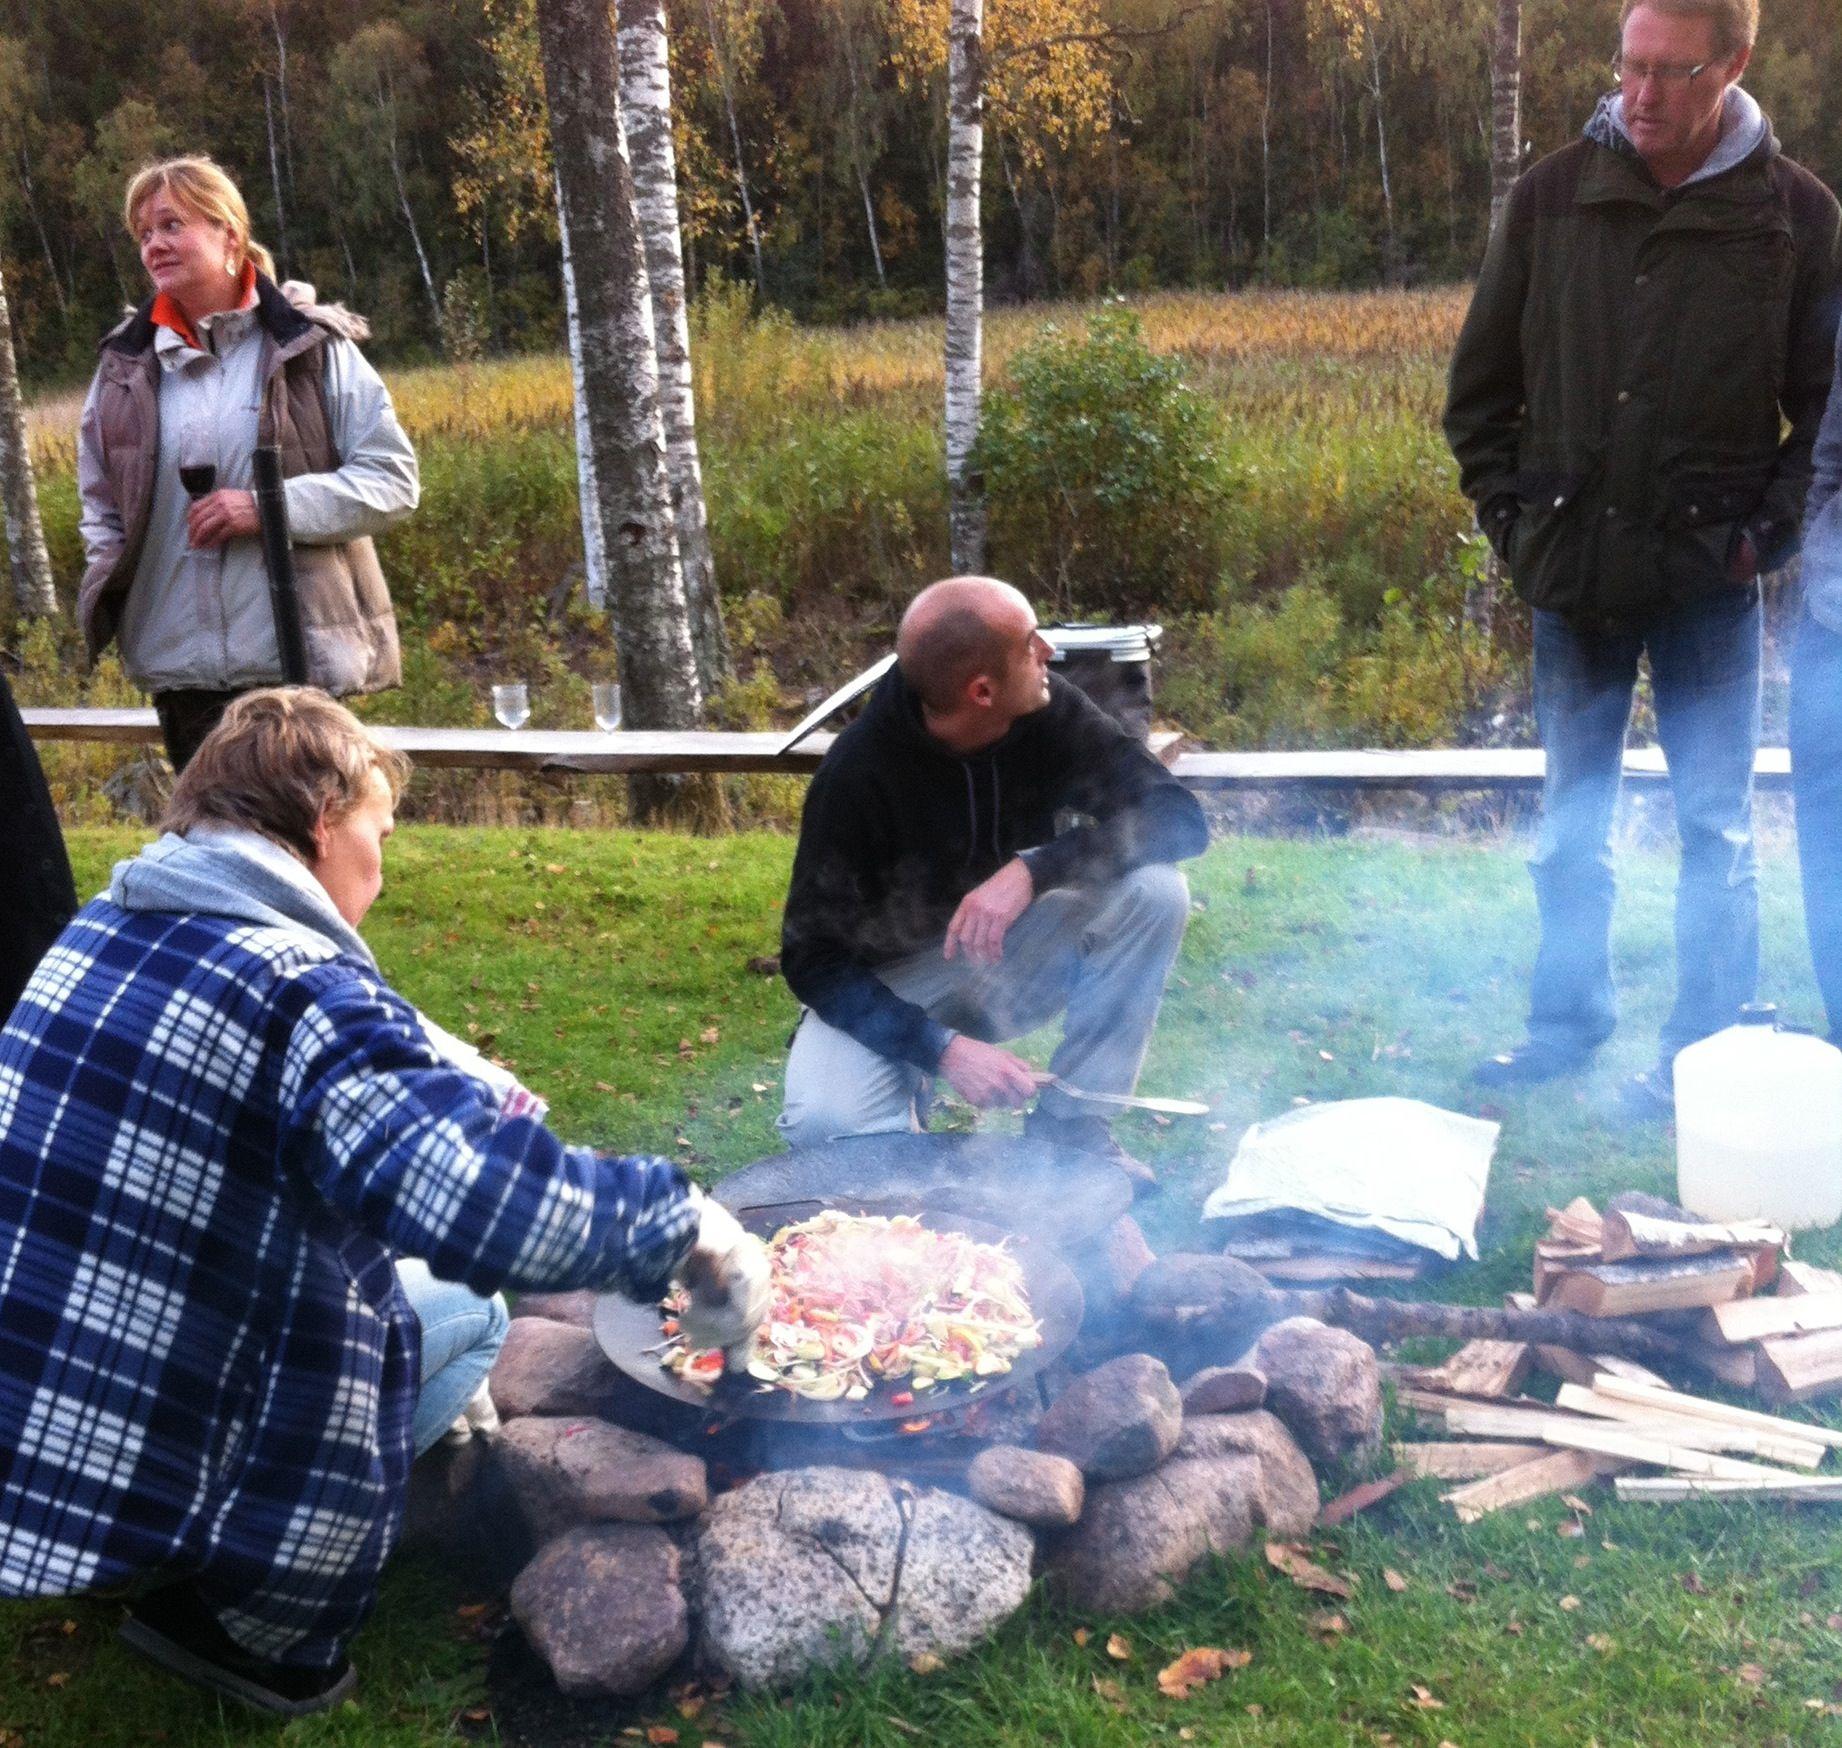 Erika from Målsånna farm making veggie wok and dan from Utefolk preparing bread.